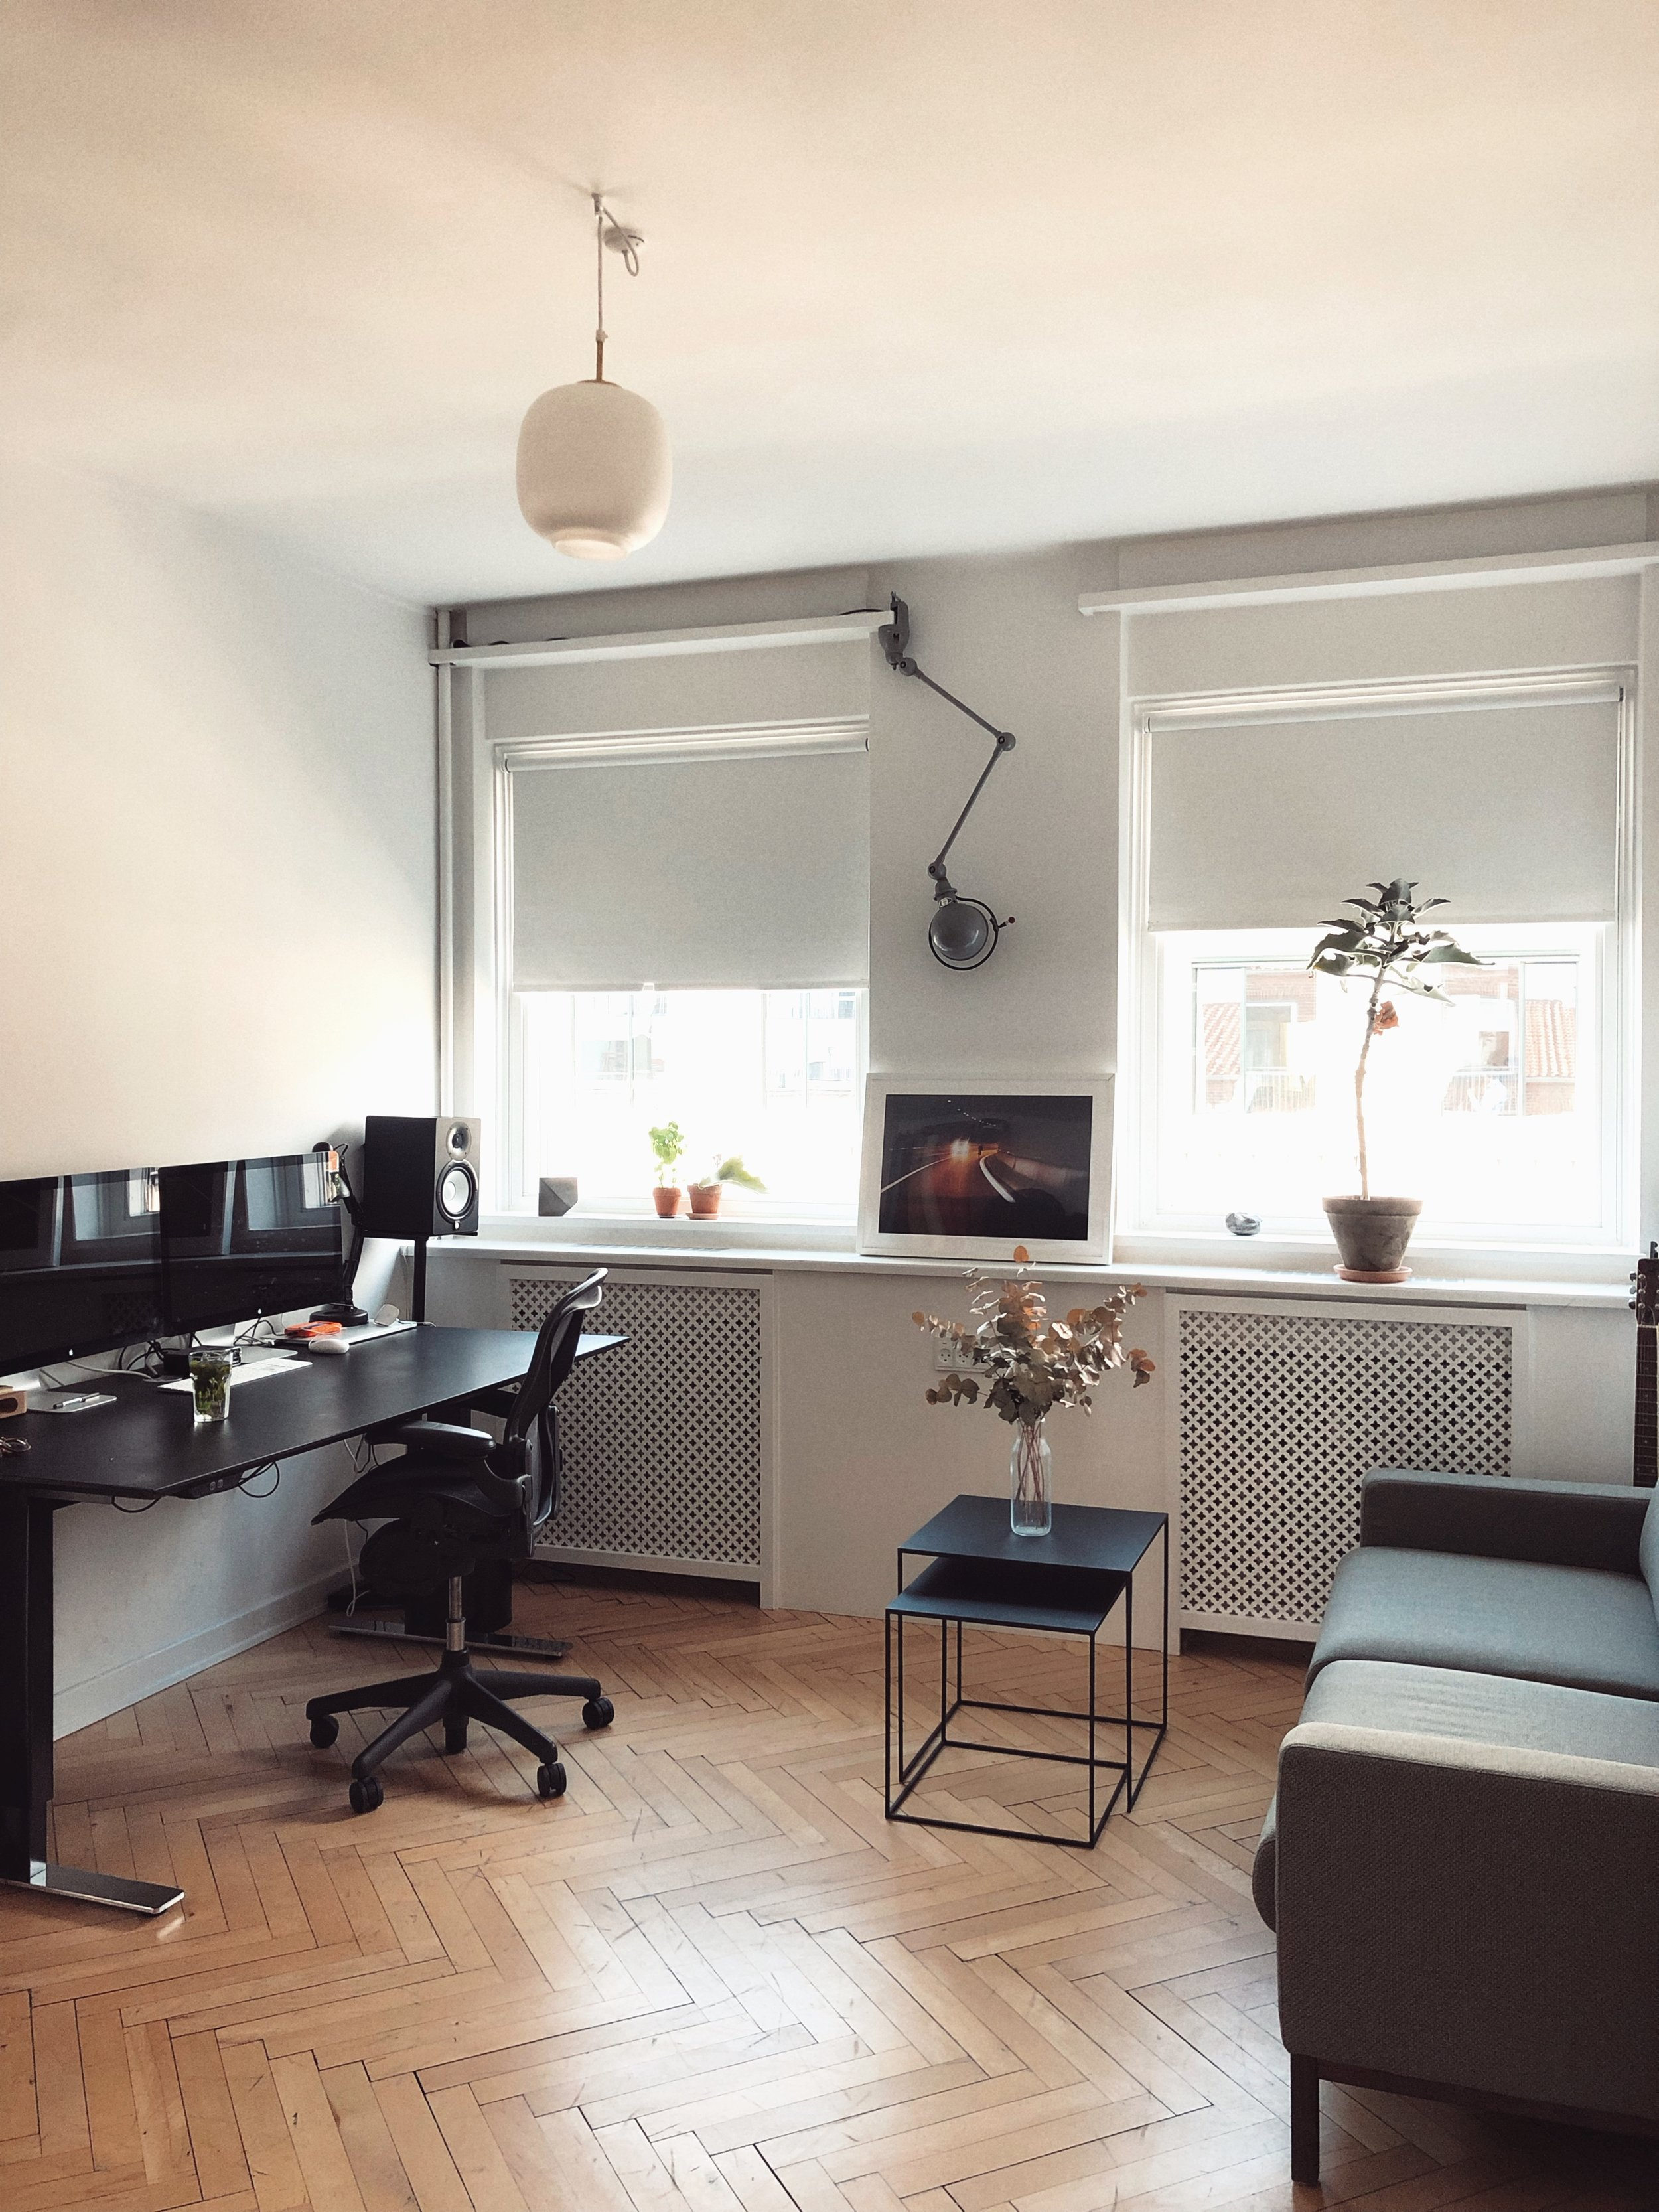 @ The Base studio